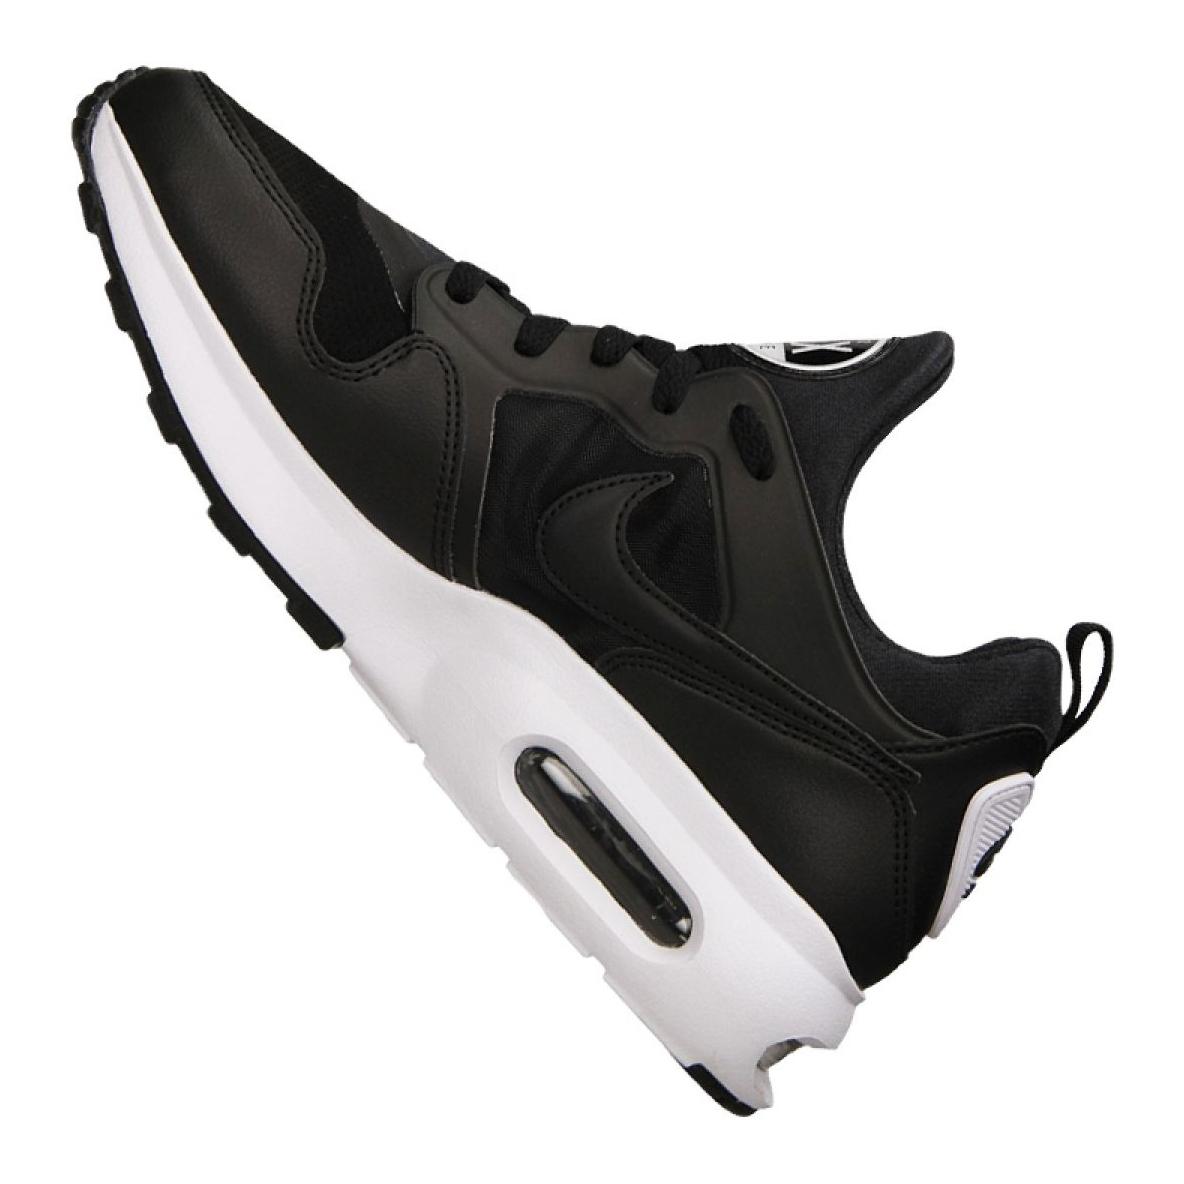 Details about Nike Air Max Prime Sl M 876069 002 shoes black